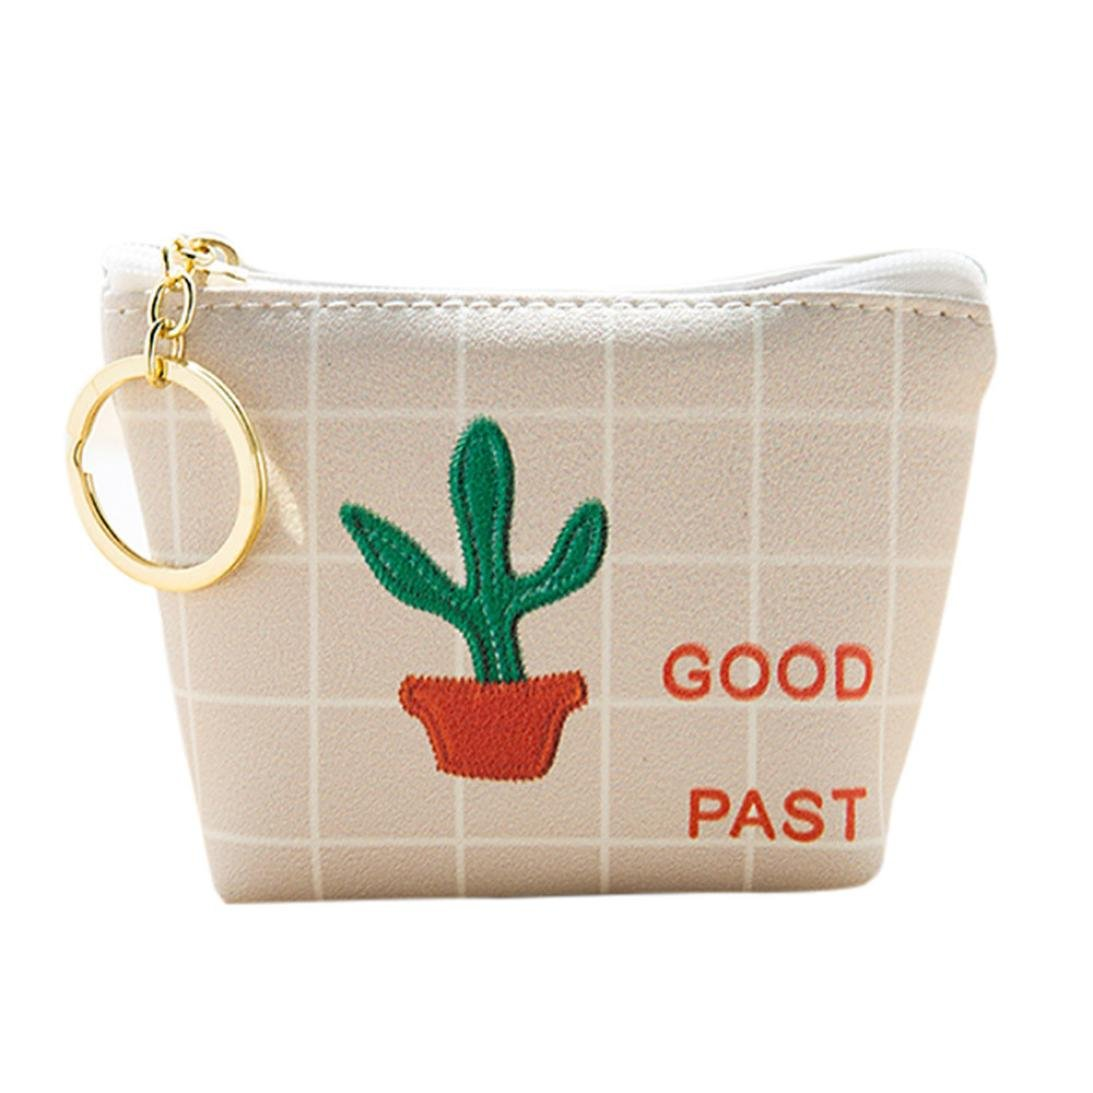 Women Love Bags,Fashion Womens Girls Cute Canvas Coin Purse Wallet Bag Change Pouch Key Holder (Beige)